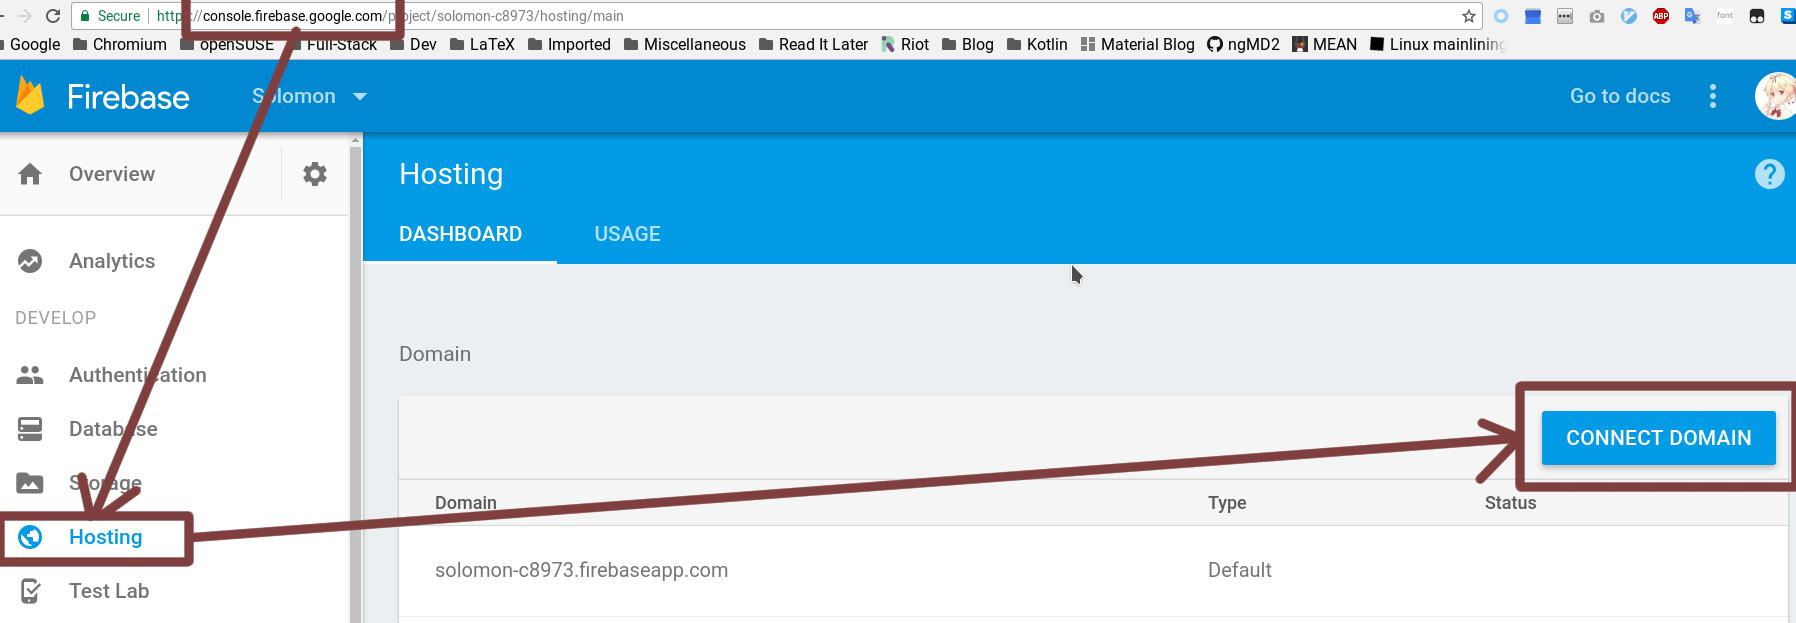 Open Firebase Console